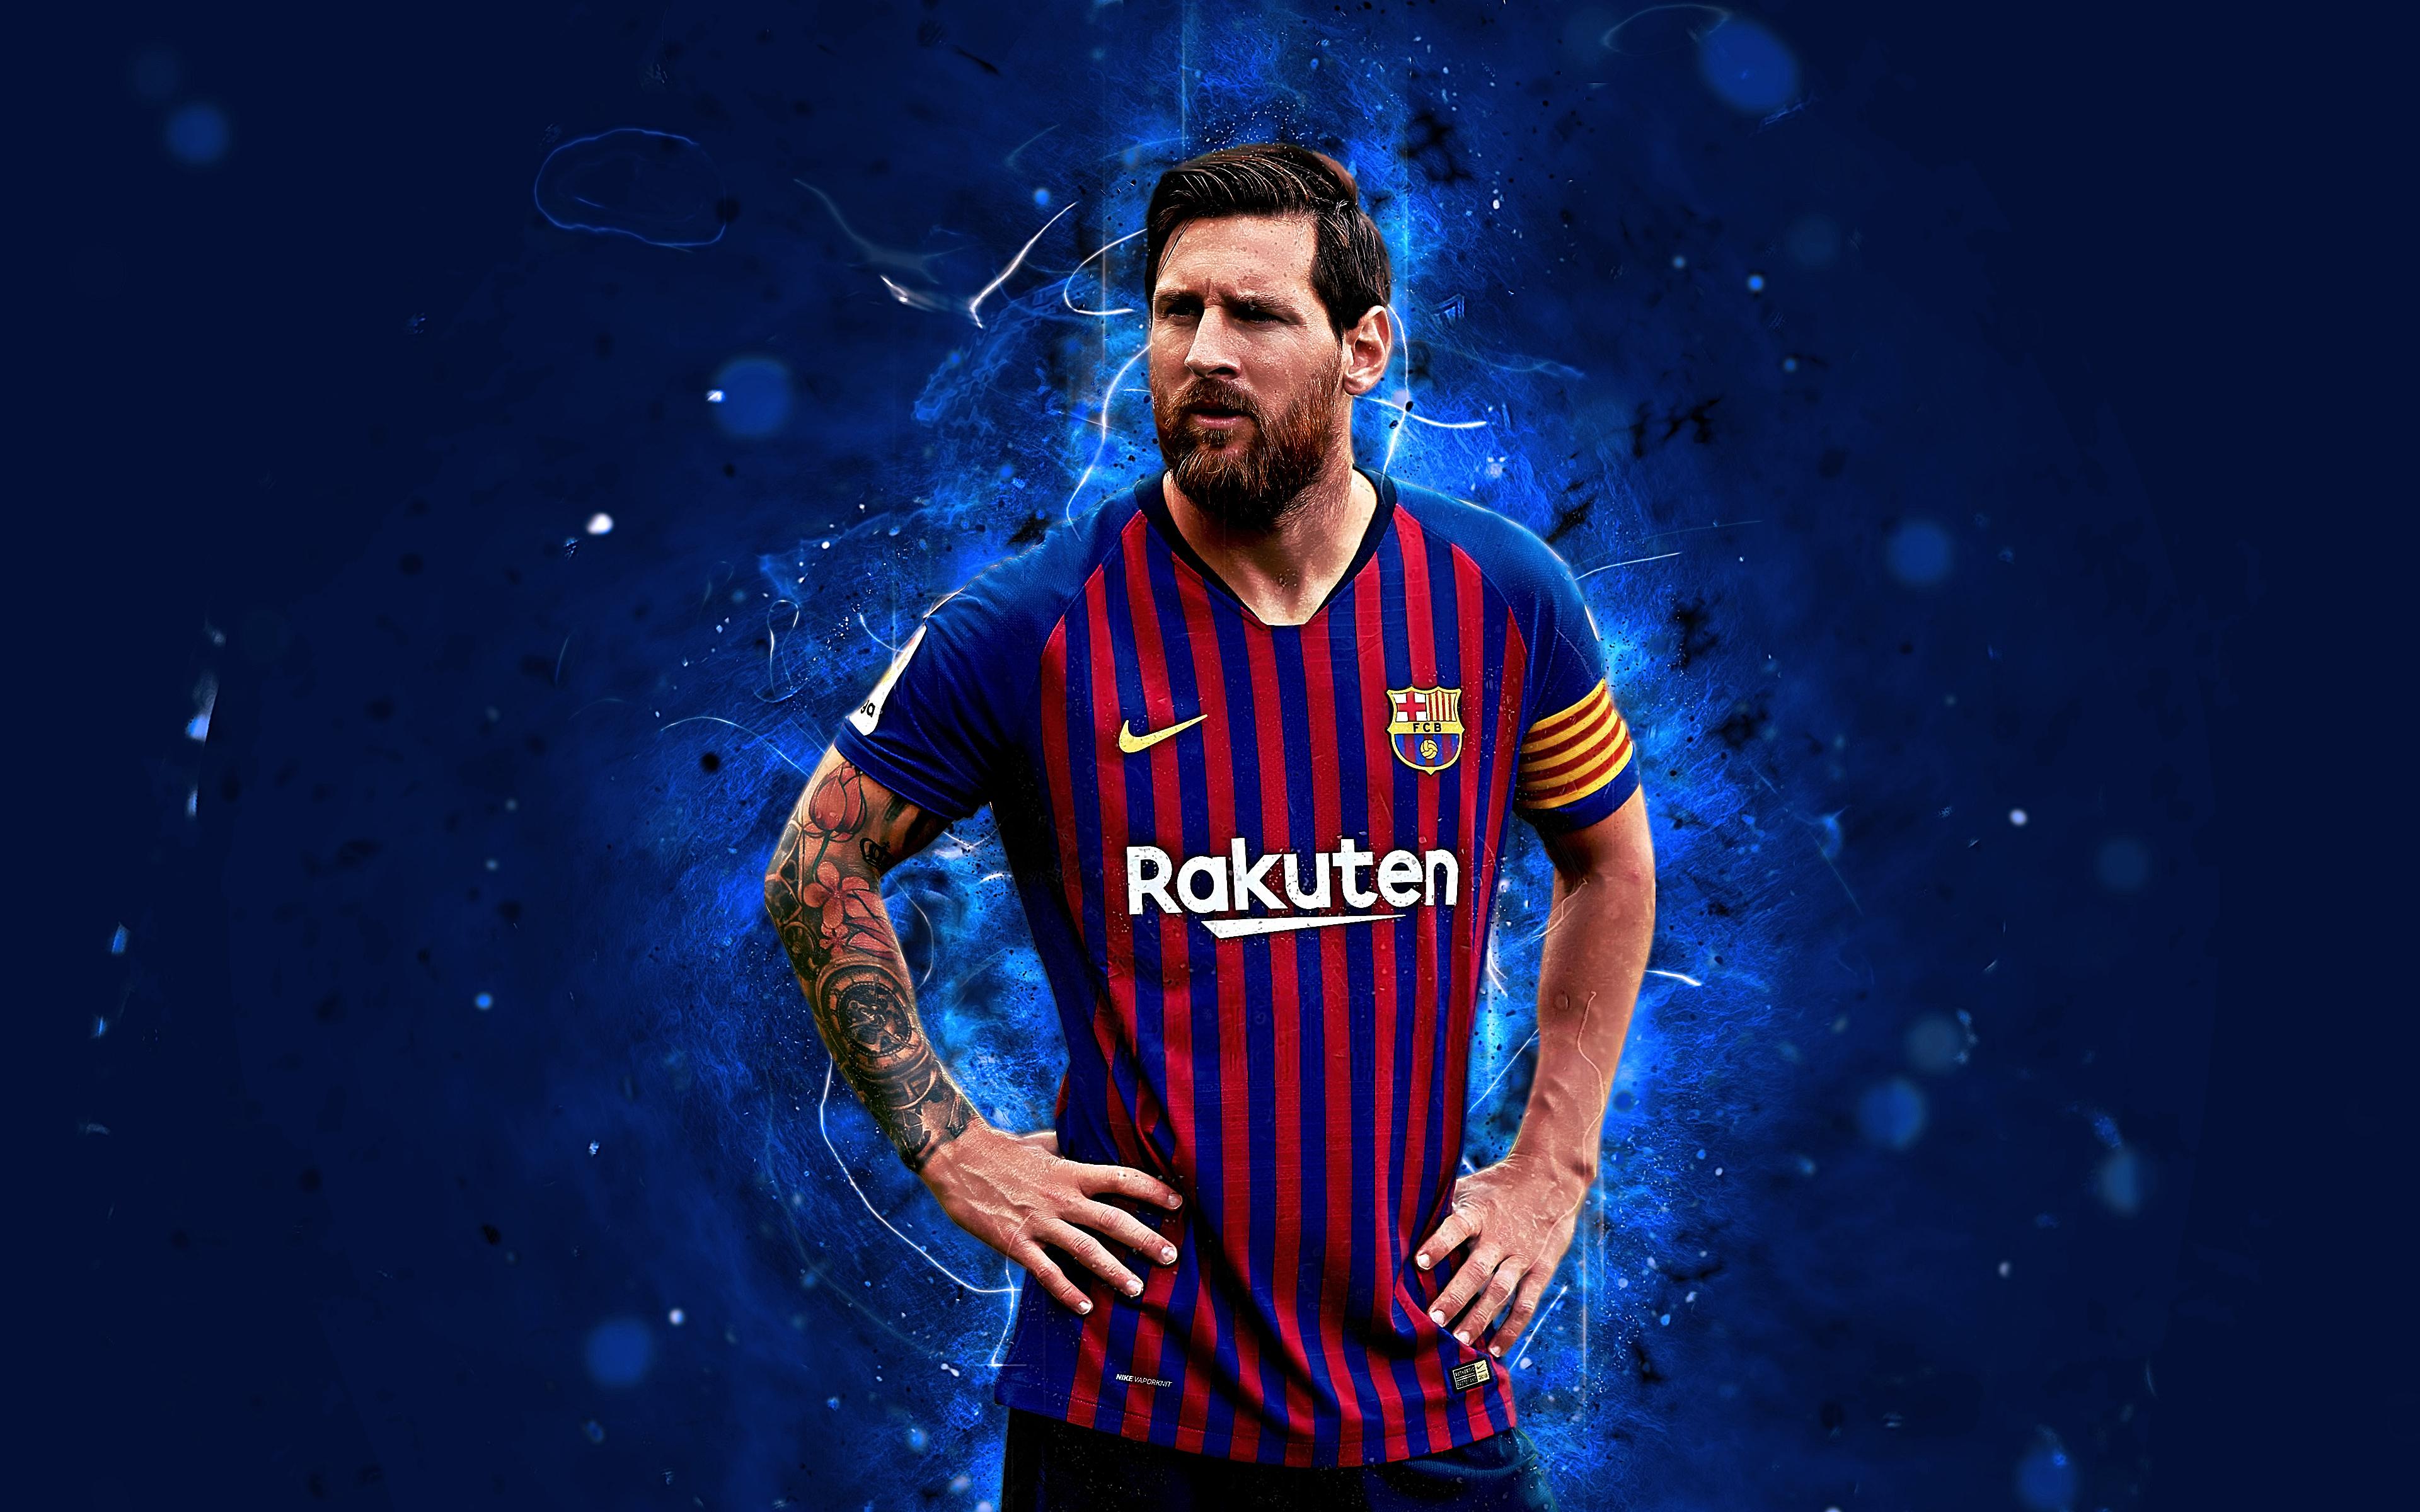 Lionel Messi - Barca 4k Ultra HD Wallpaper | Background ...